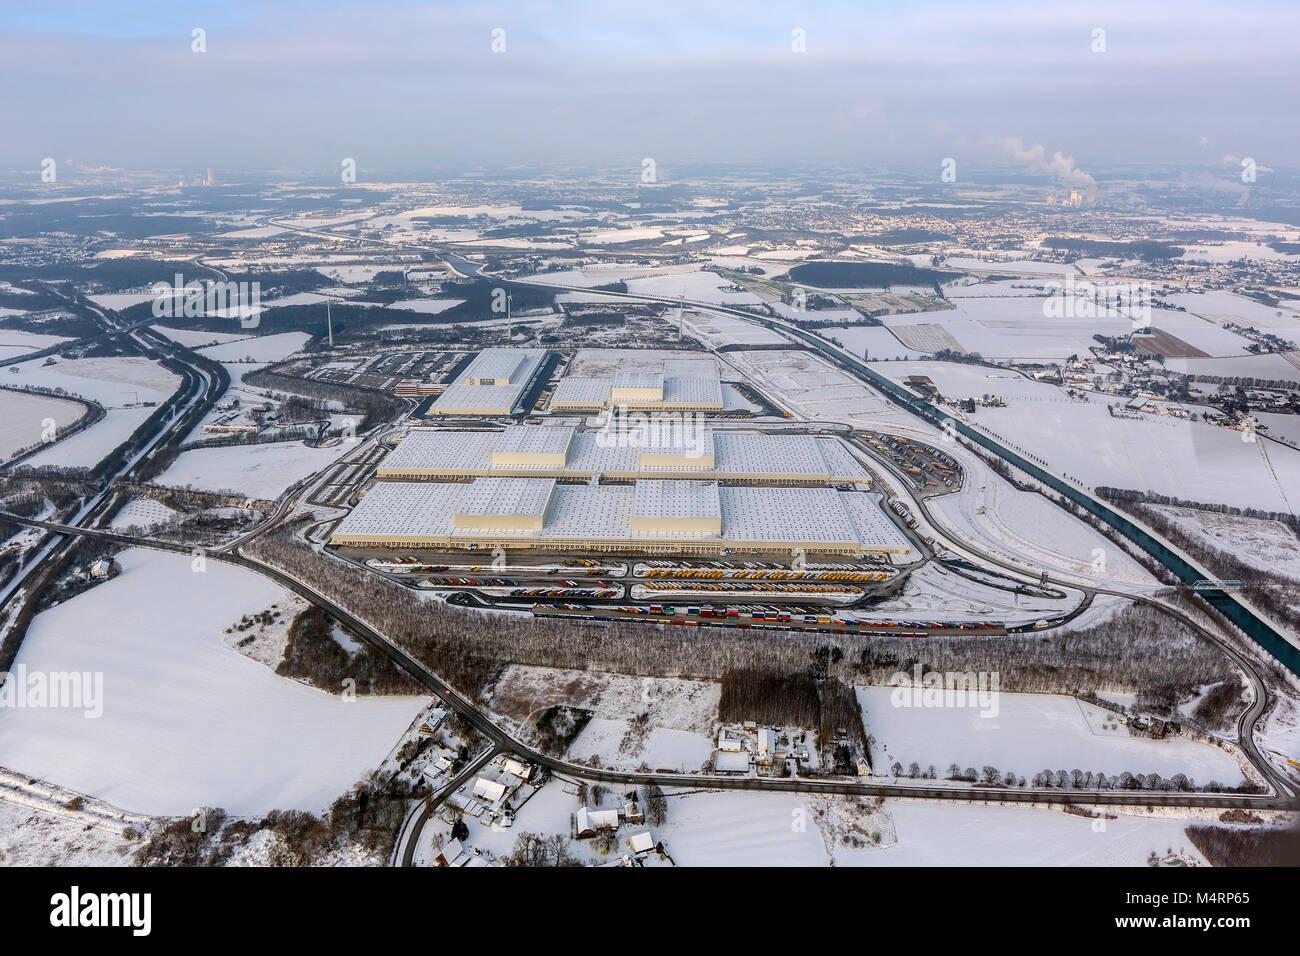 Aerial view, IKEA warehouse, IKEA Europe logistics, Dortmund, Ruhr area, North Rhine-Westphalia, Germany, Europe, Stock Photo